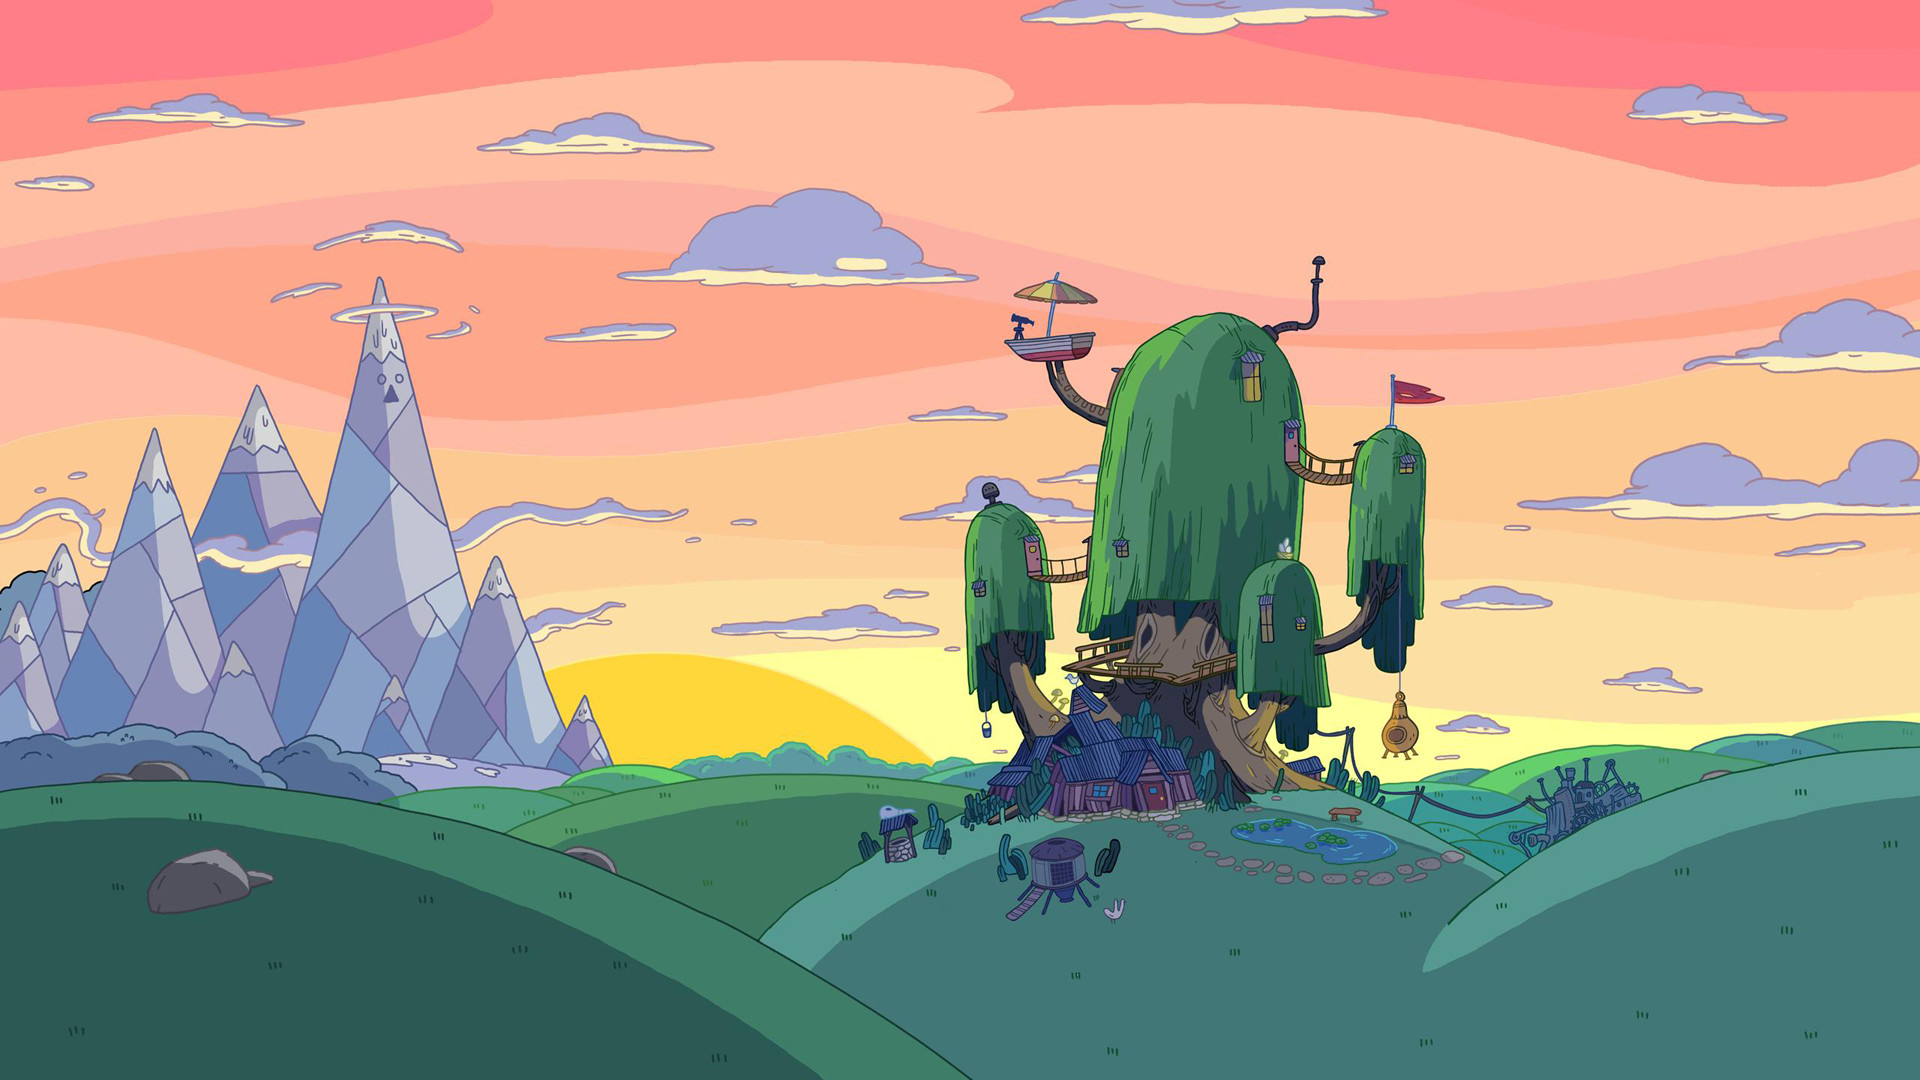 …  https://www.pixelstalk.net/wp-content/uploads/2016/01/Adventure-Time-Background-HD.jpg  …